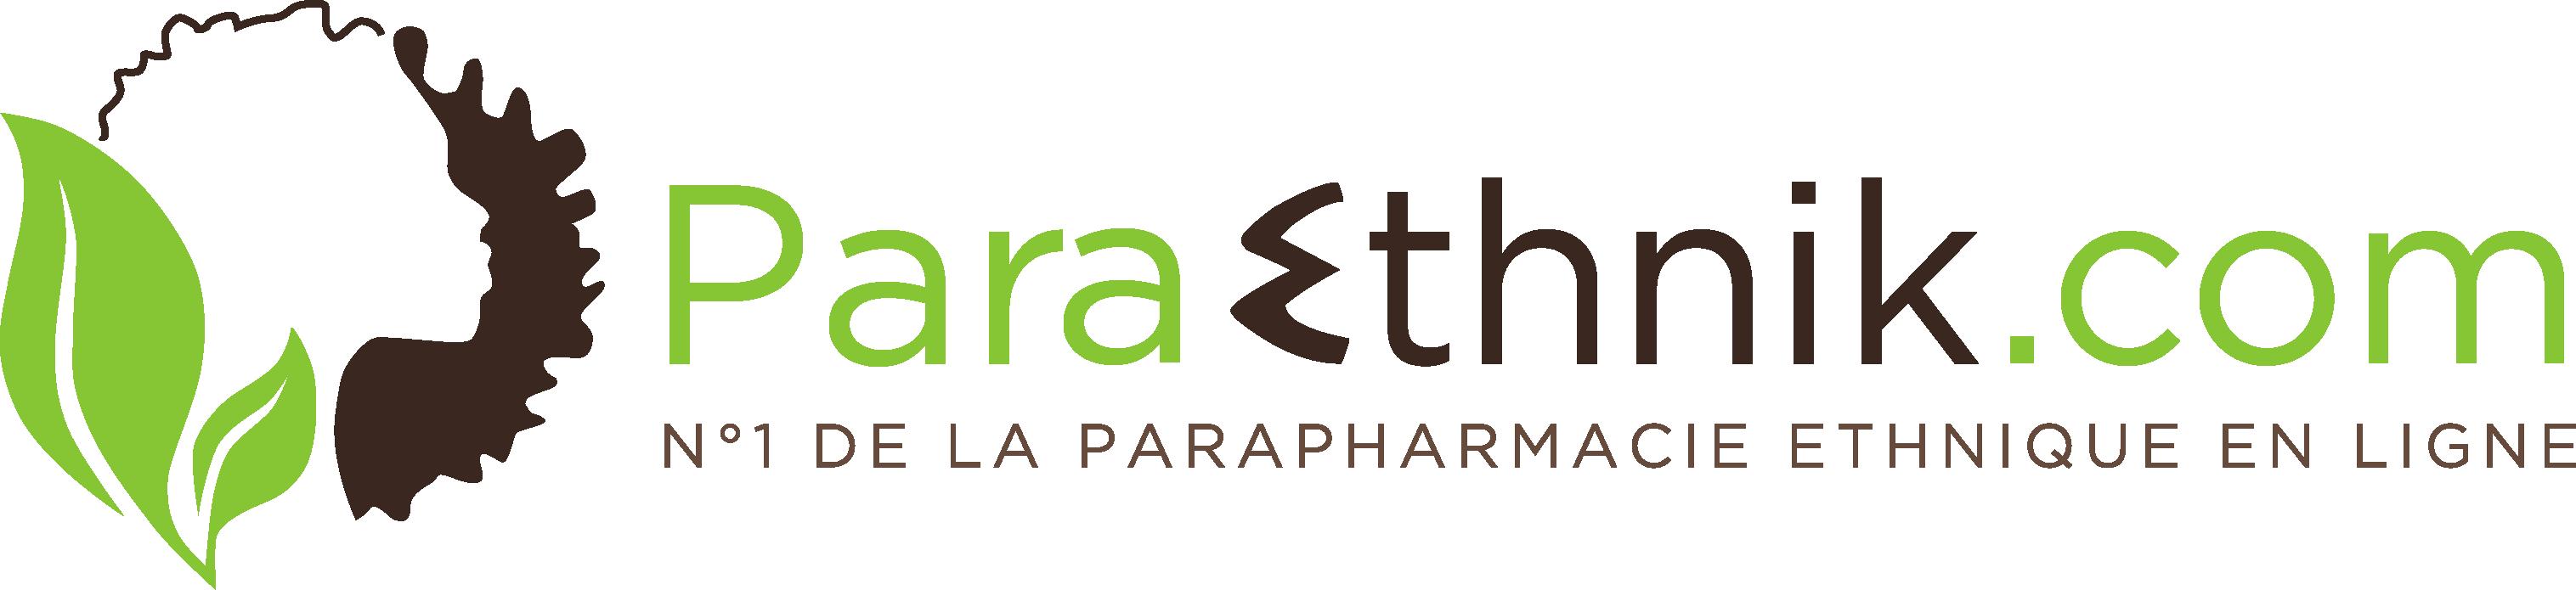 Country Partner Logo